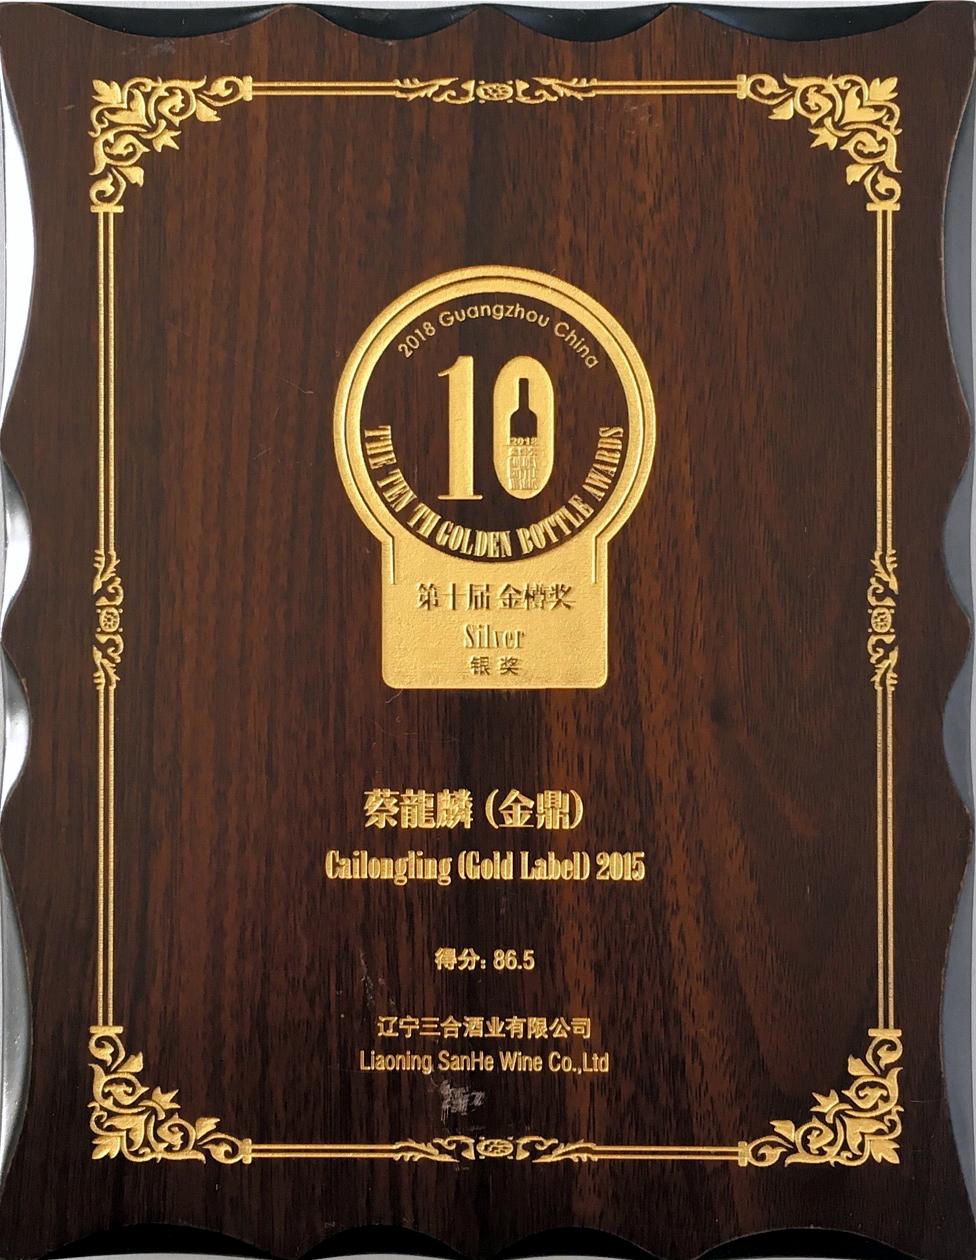 <span><span>第十届金樽奖银奖(金鼎2015)</span></span>